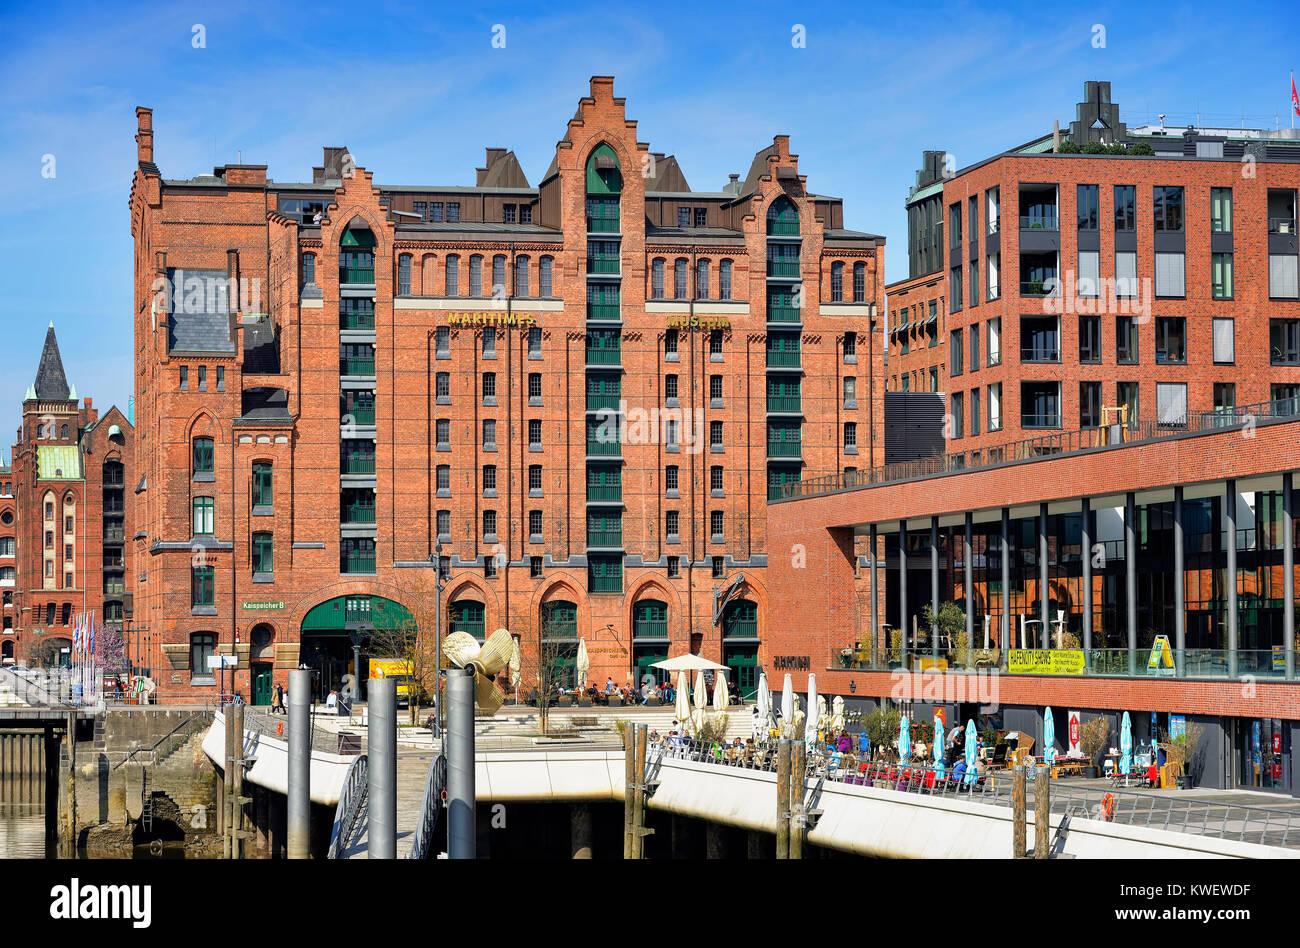 International maritime museum and Elbarkaden in the harbour city of Hamburg, Germany, Europe, Internationales Maritimes - Stock Image